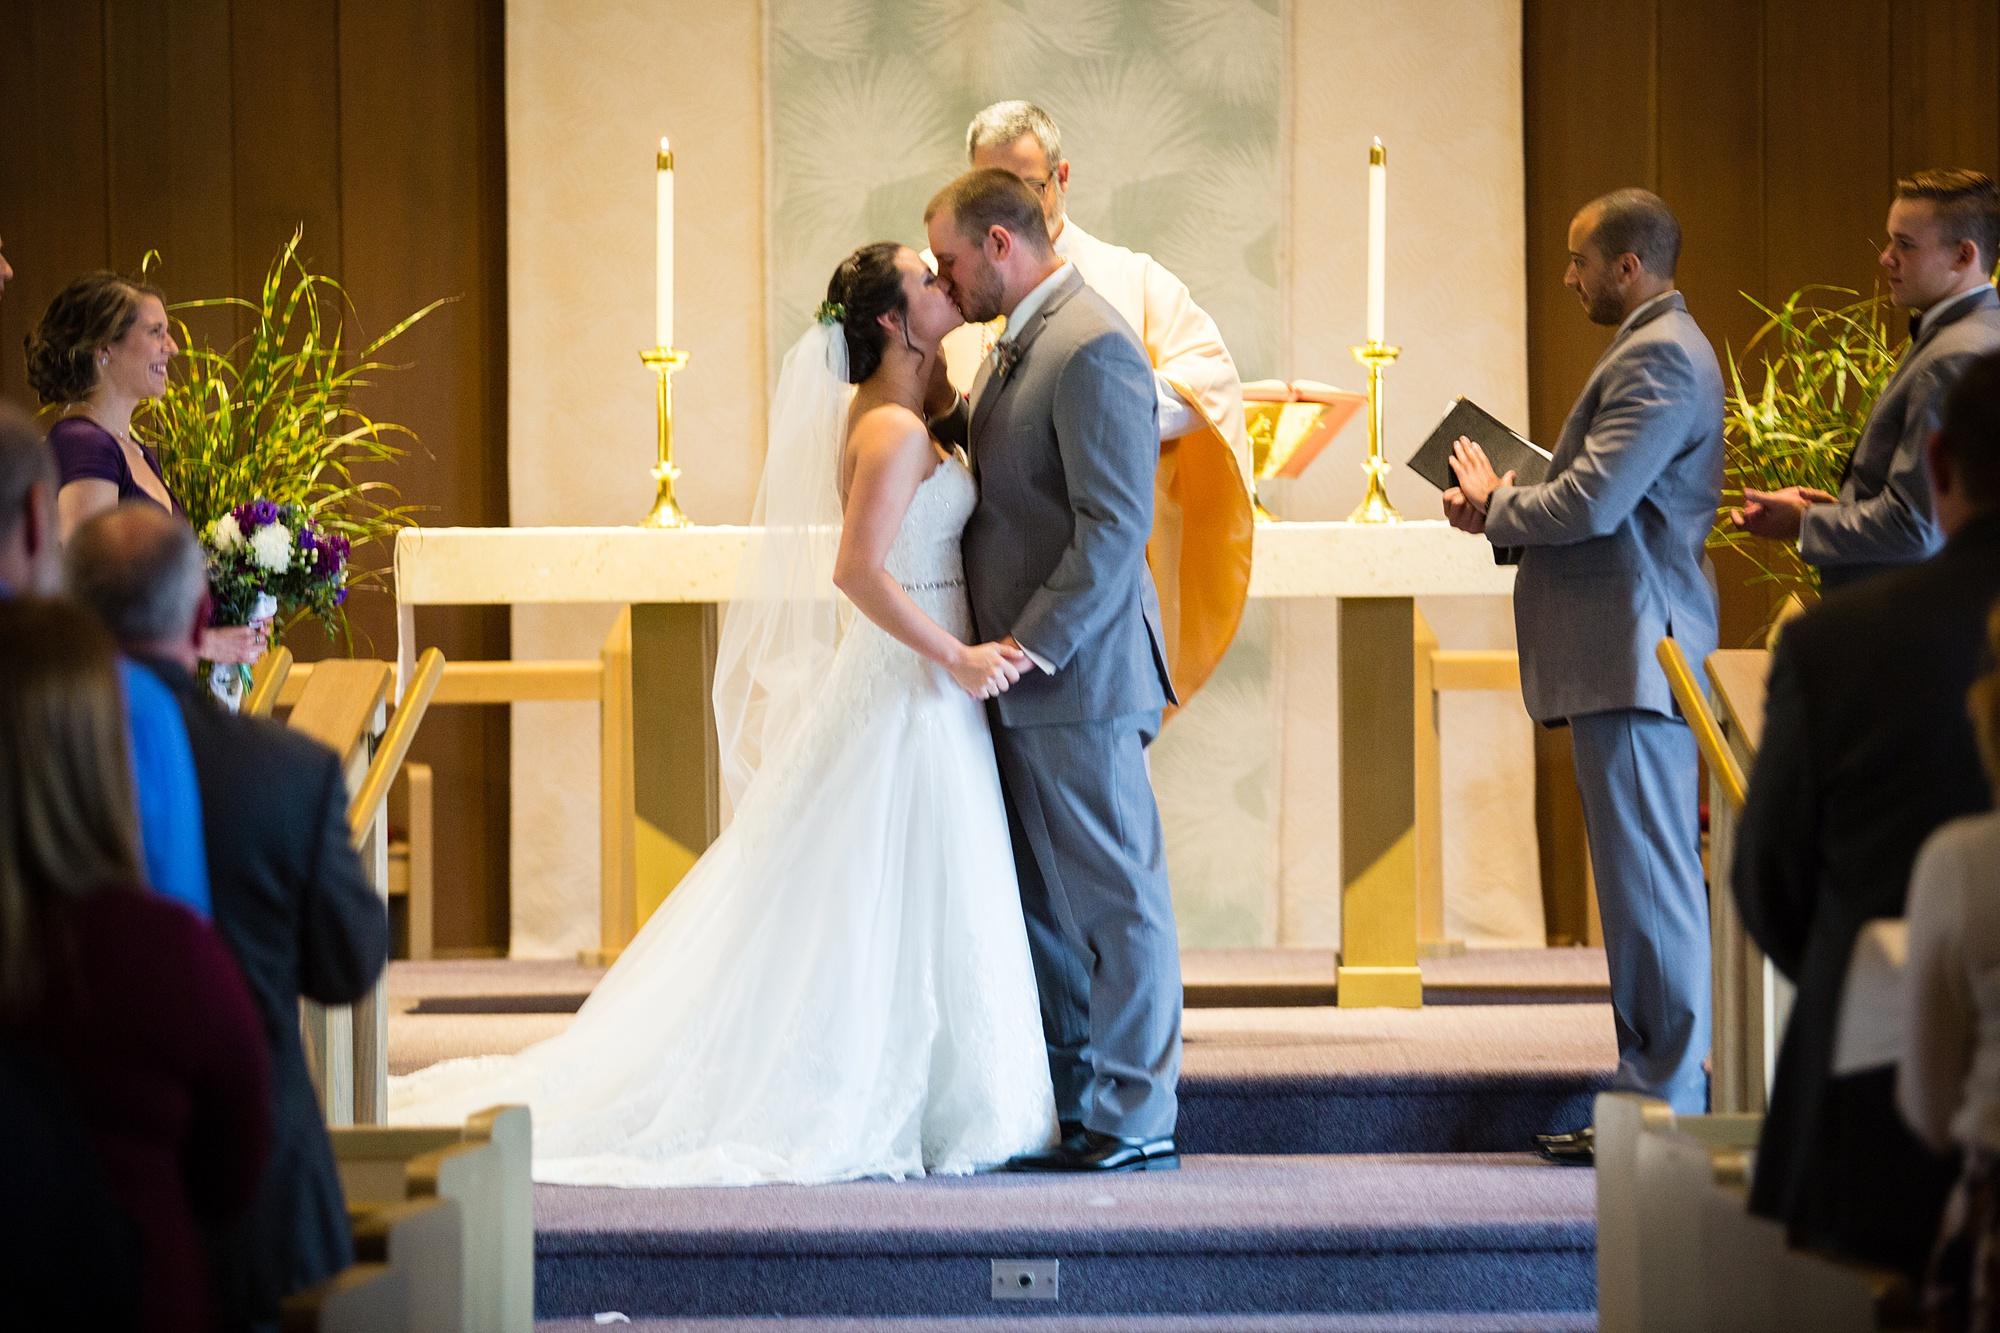 Brandon_Shafer_Photography_Emily_Travis_Kalamazoo_Wedding_Photography_0028.jpg